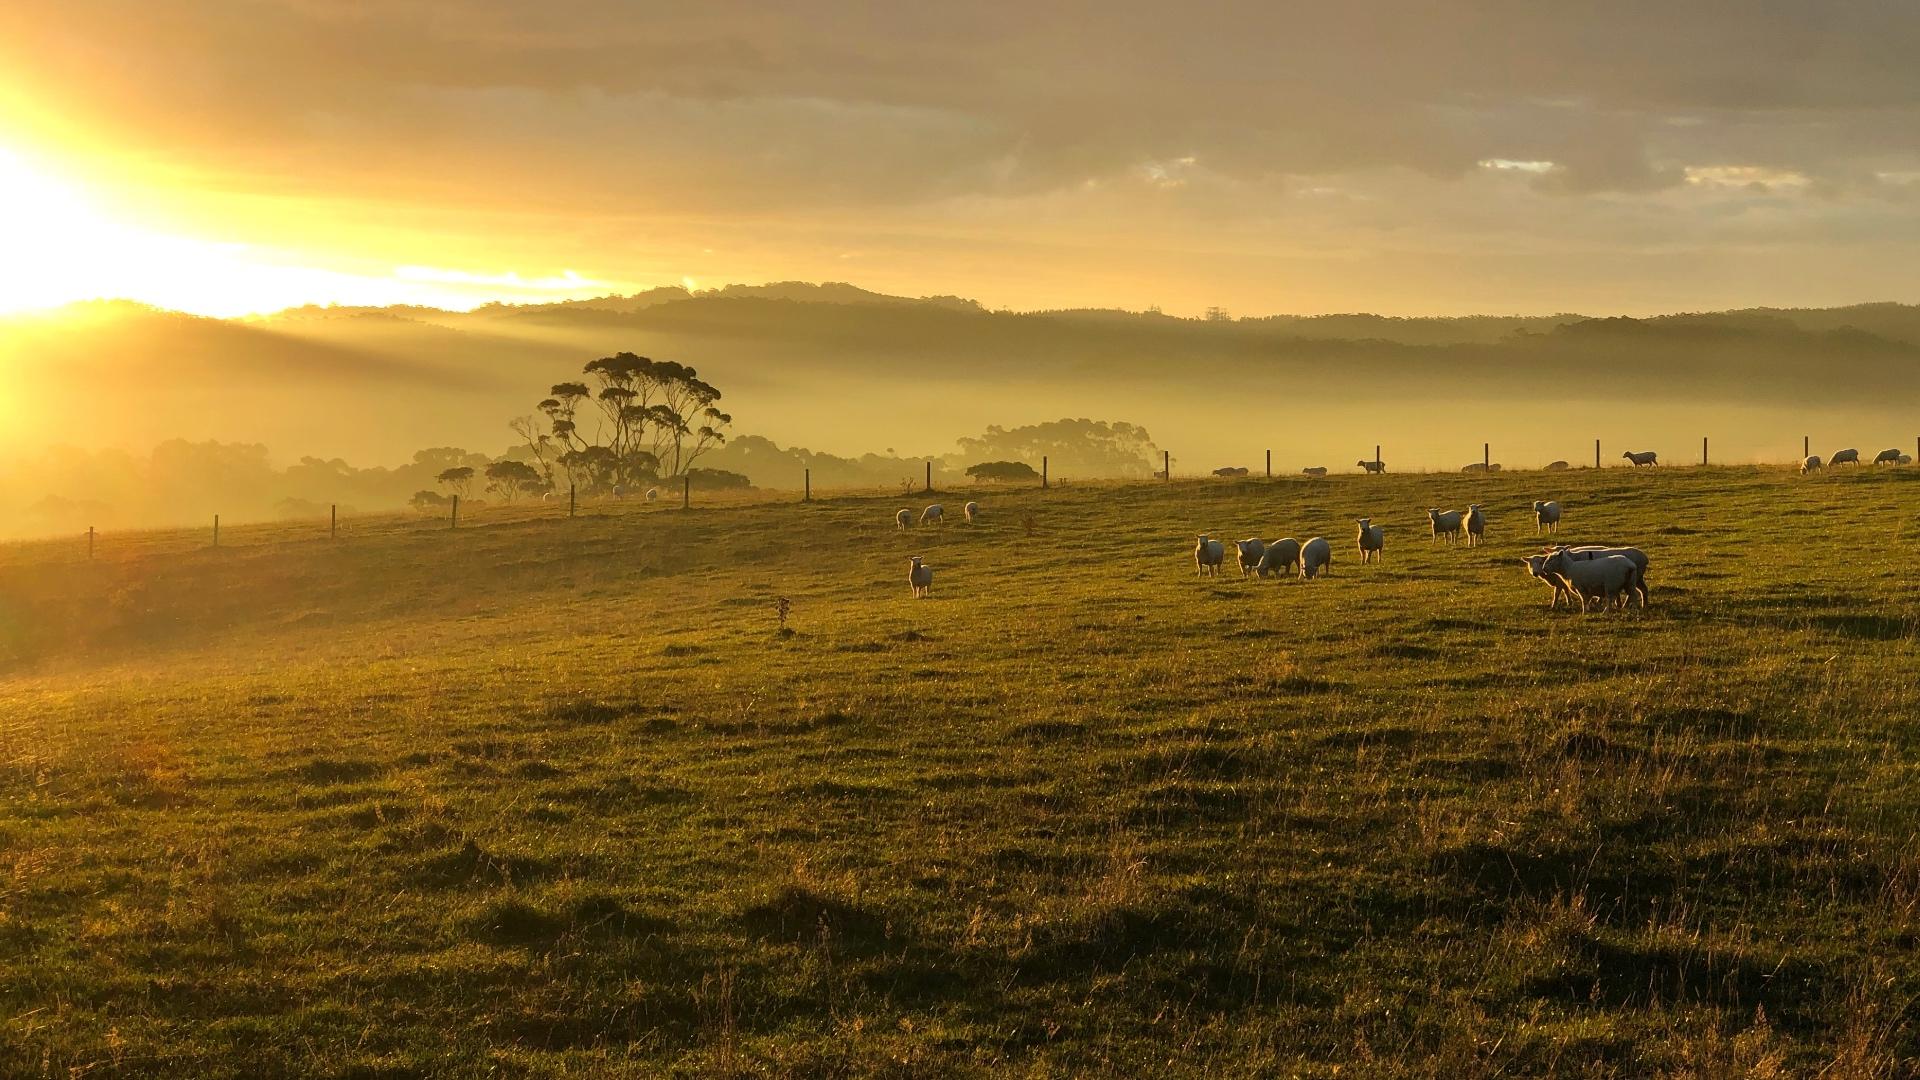 Studio Garden View of Sheep